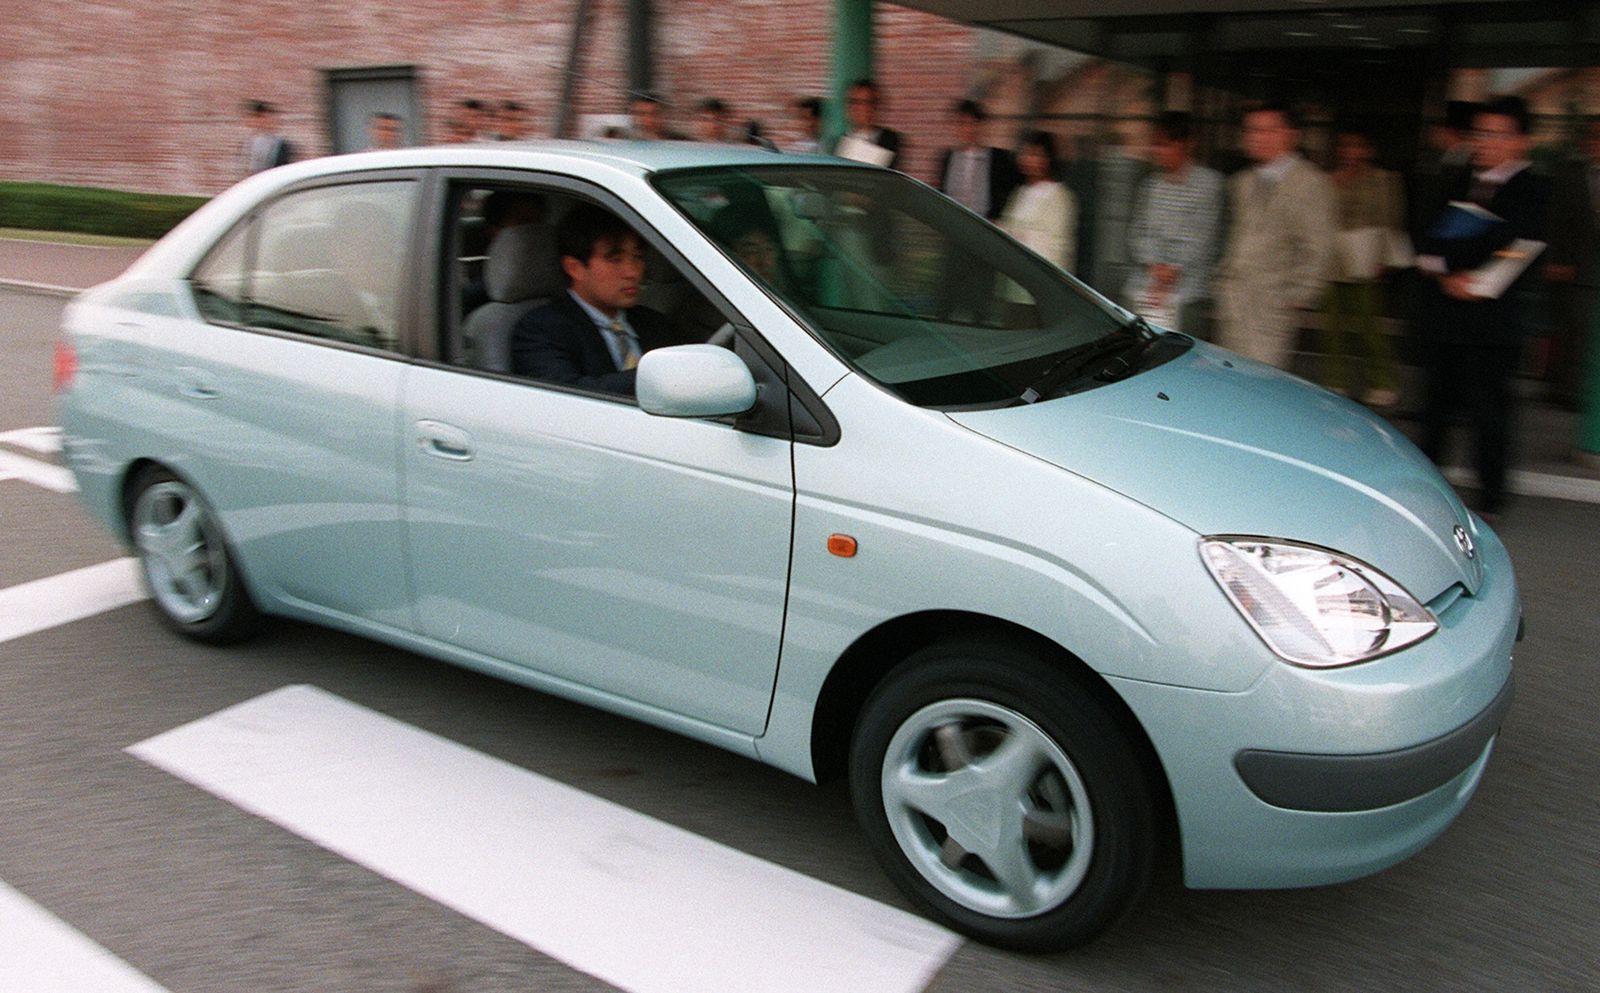 Toyota Motor Unveils Hybrid Vehicle 'Prius'